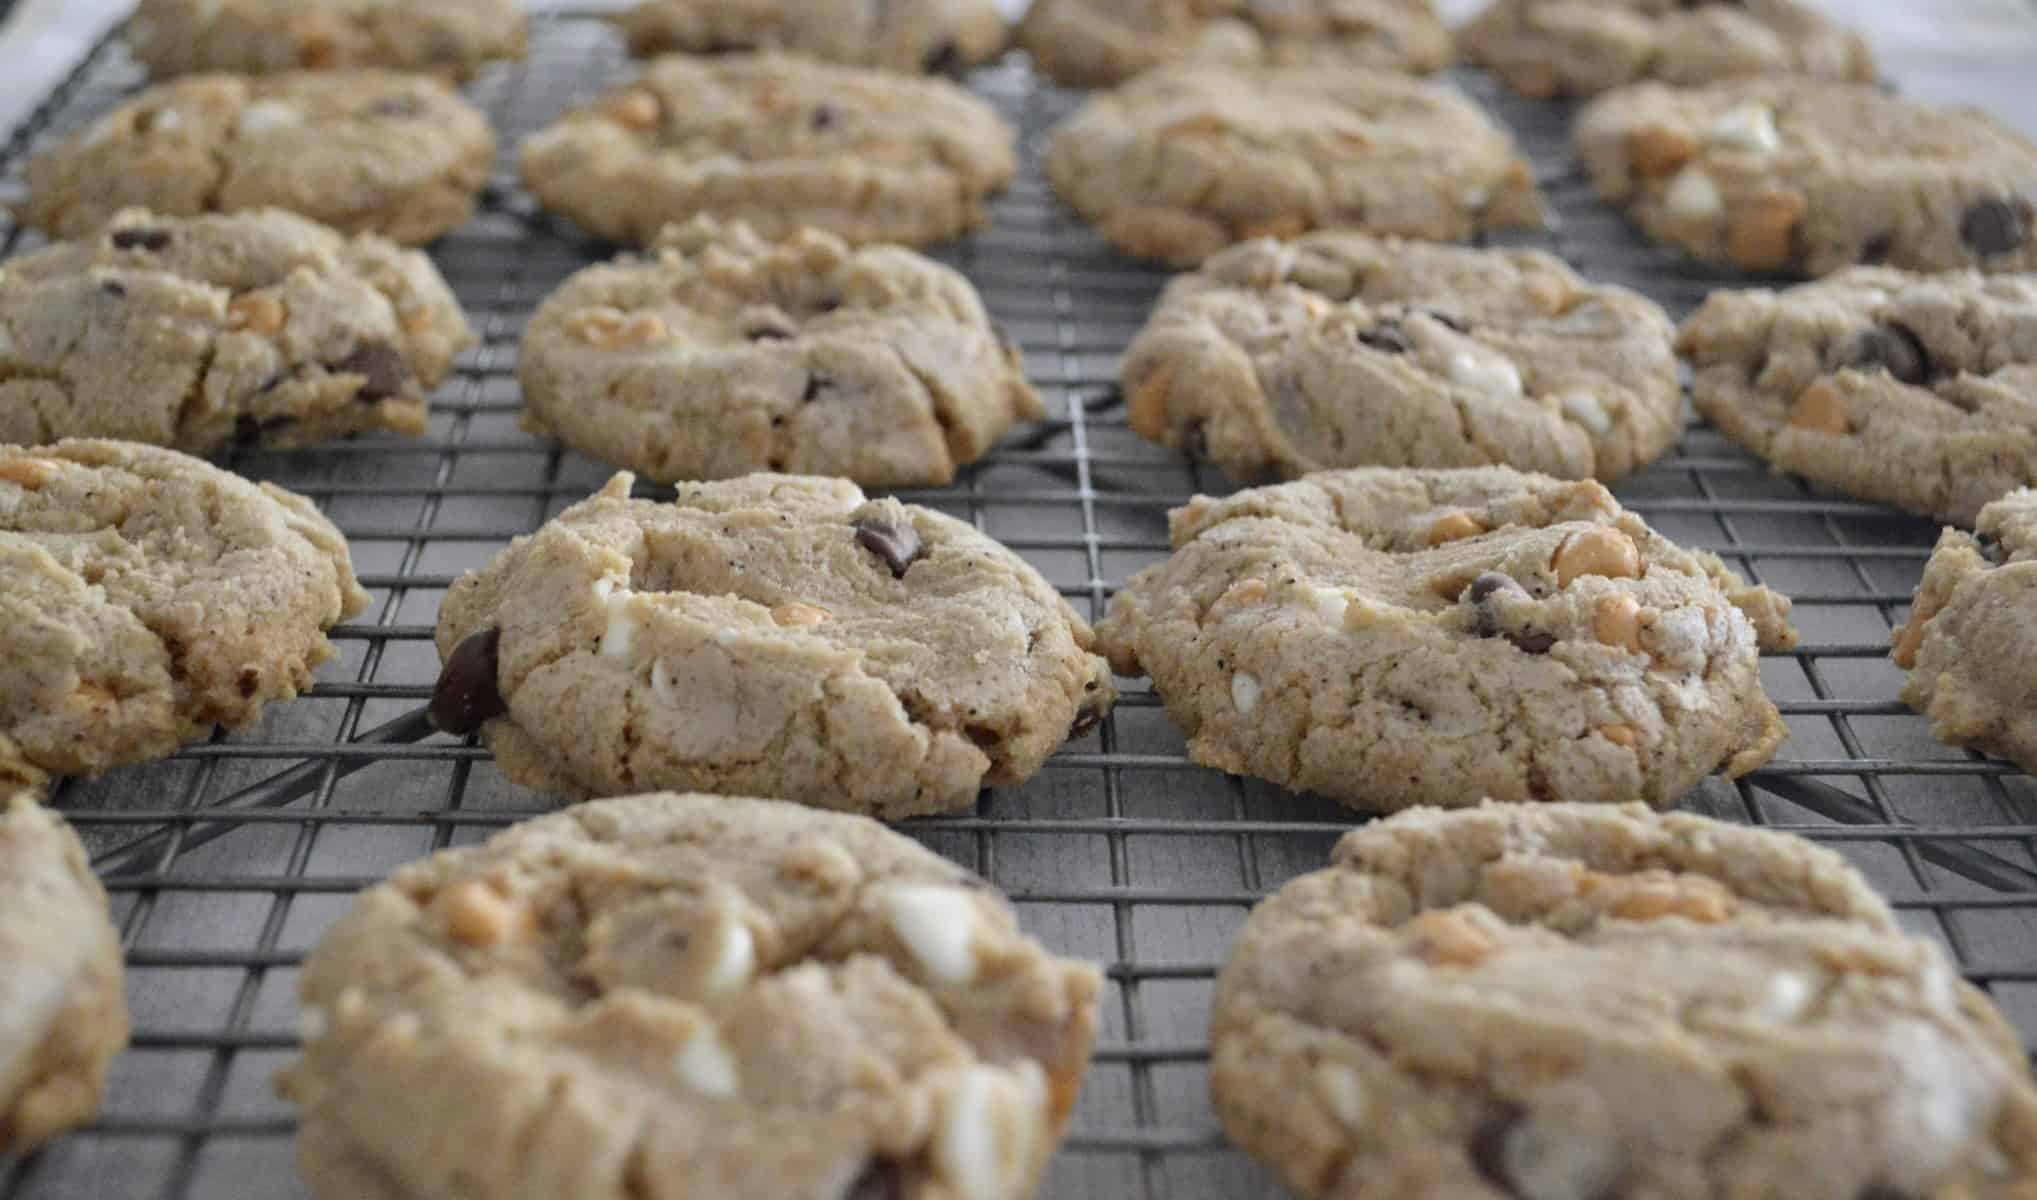 Triple Chocolate Chip Cookie dough